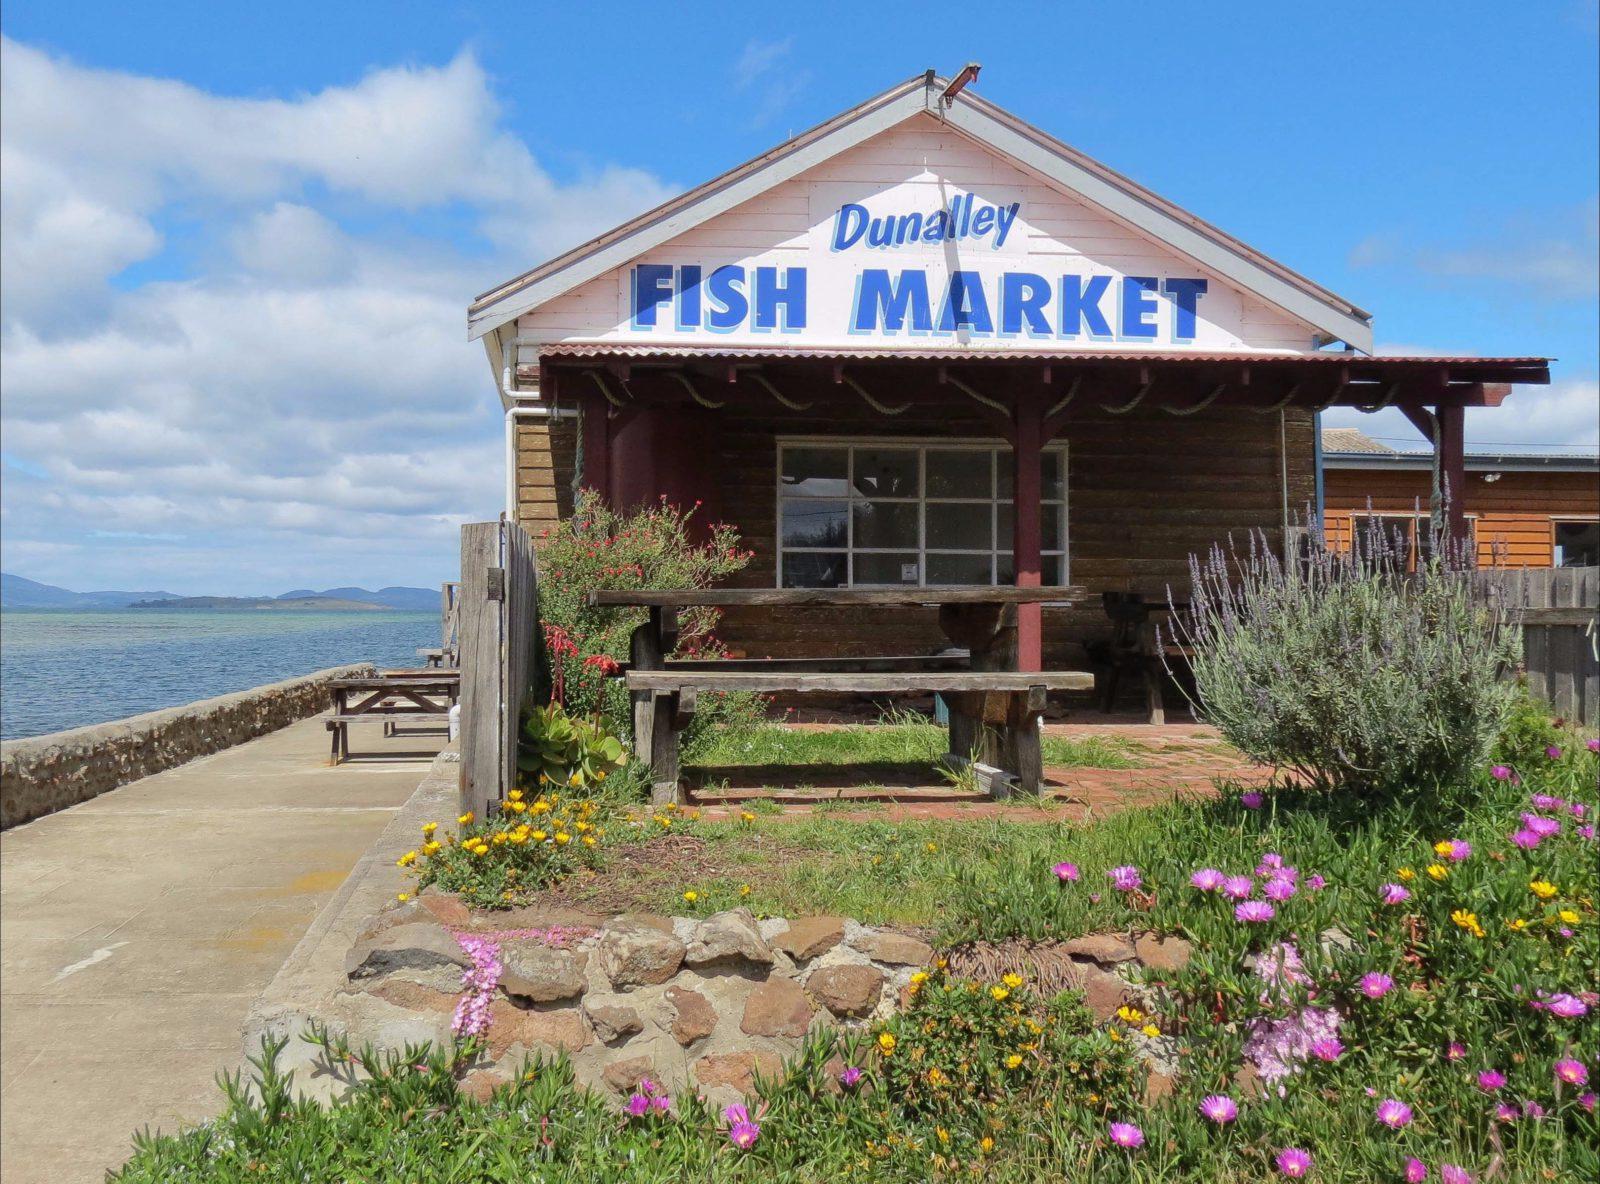 atdw-dunalley-fish-market-5832747293546f2b1ffc9fc1-1600x1184.jpeg